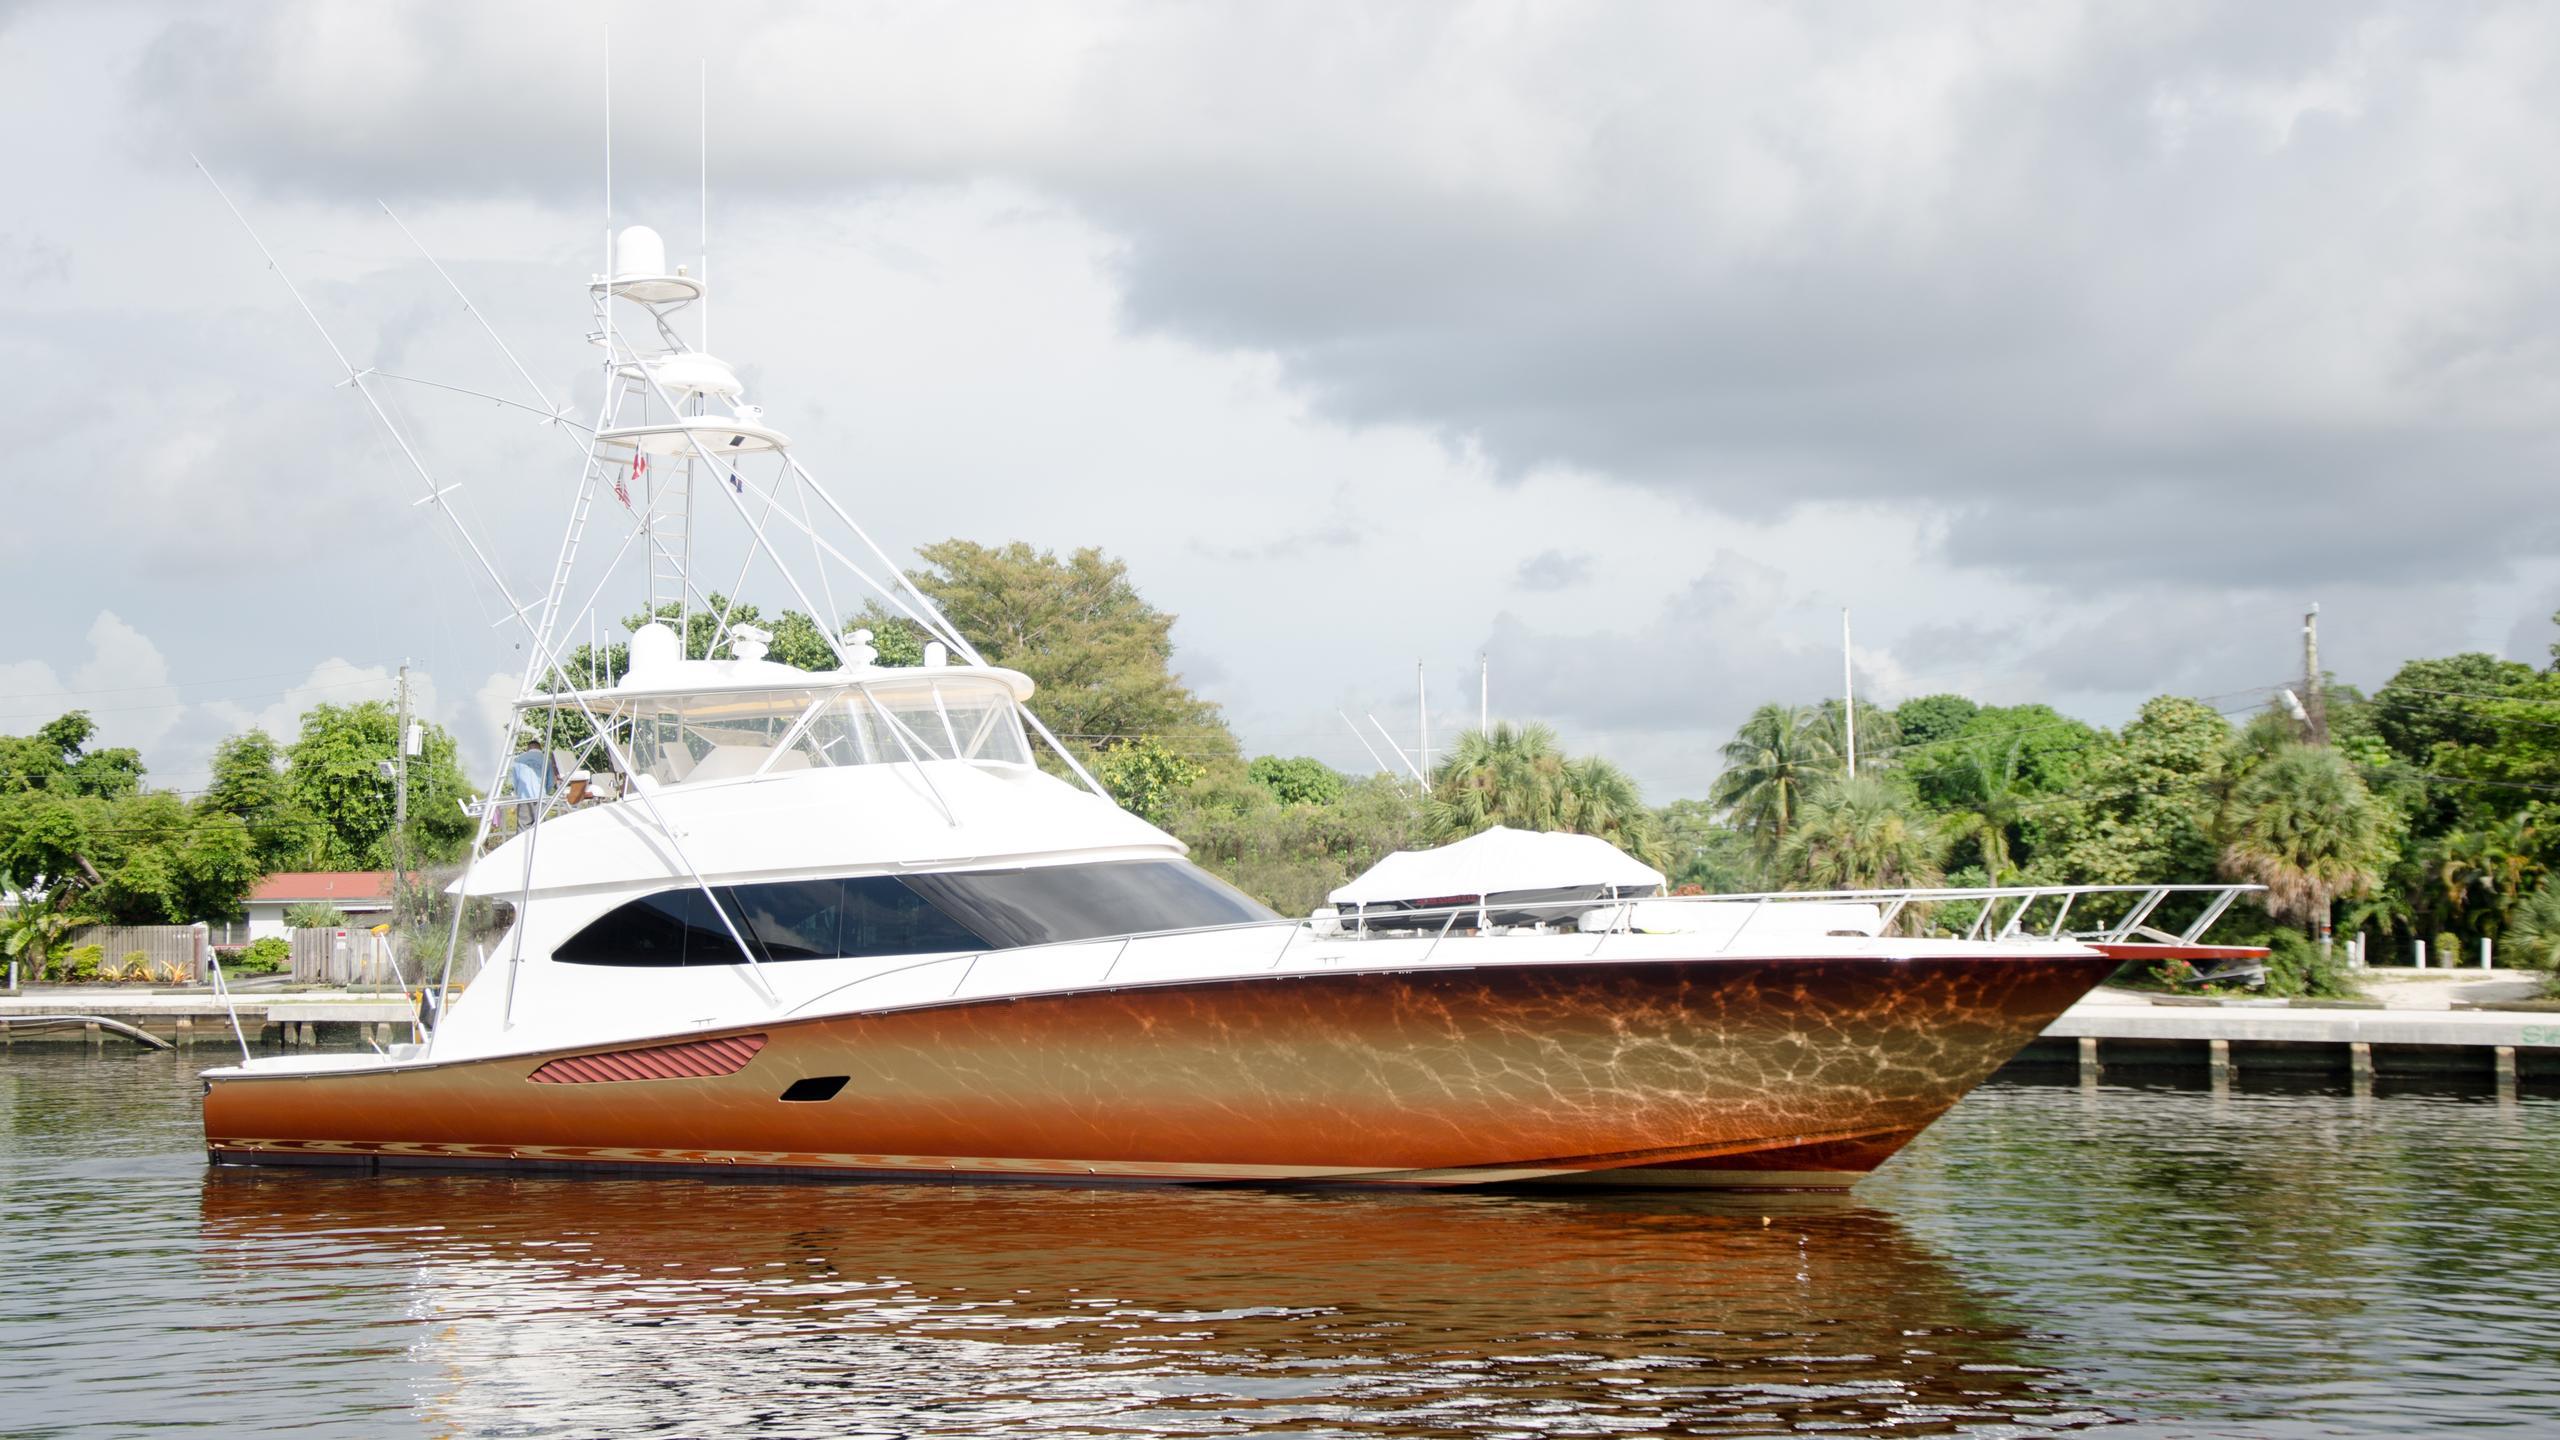 mustang sally sea duce sportfish motoryacht viking 82 2009 25m profile pre-refit